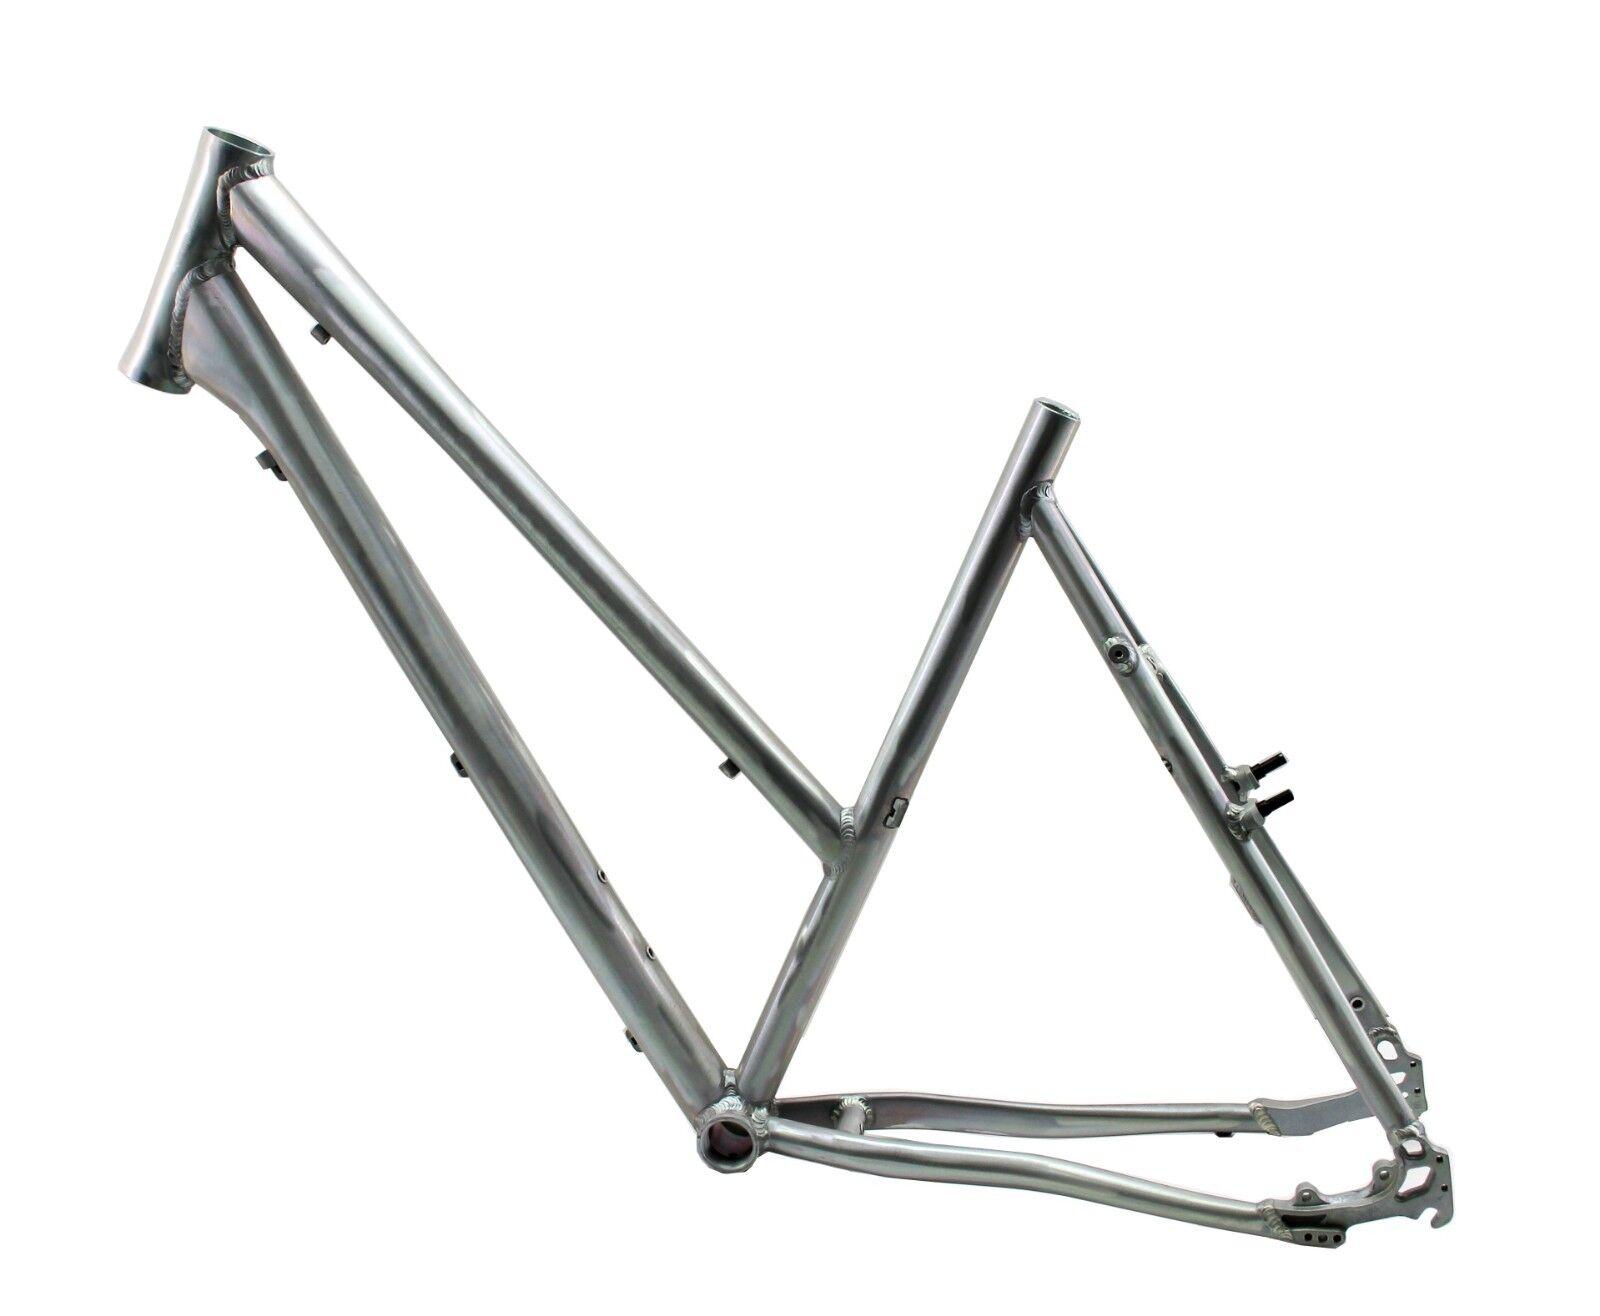 Aluminio Rohrahmen,28  ,Rh 55 cm,Circuito de la Cadena,BSA,1 Cartón   4 Pcs.